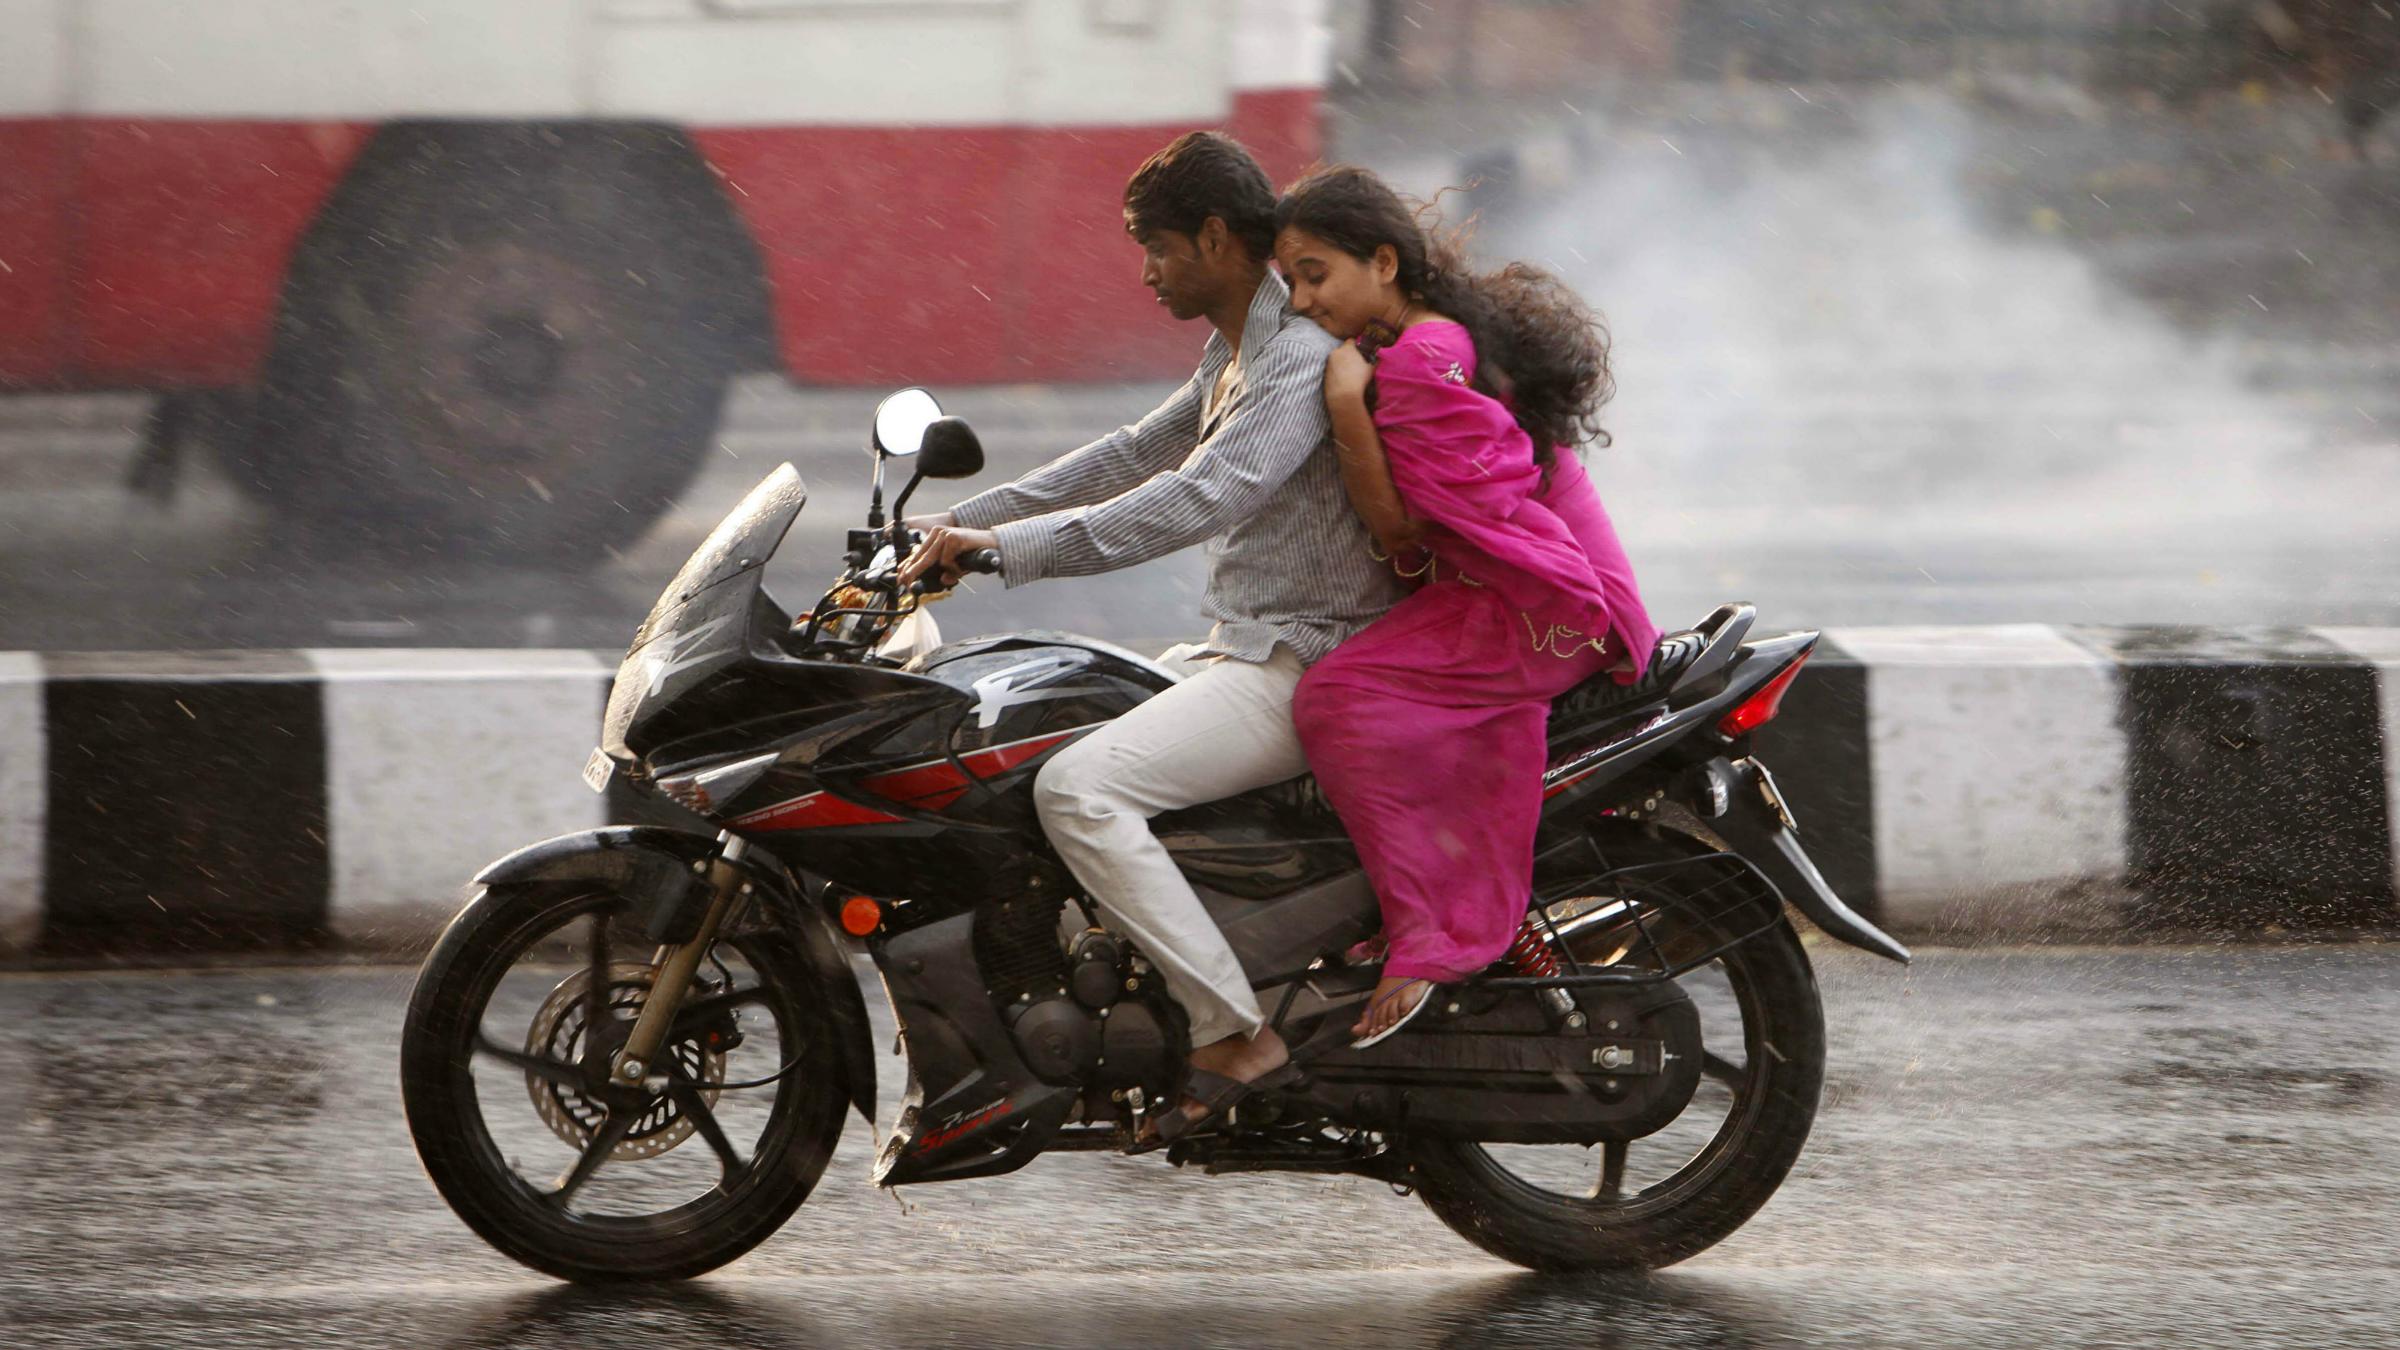 A couple rides a bike through rainfall in Hyderabad, India, Friday, April 6, 2012. (AP Photo/Mahesh Kumar A.)